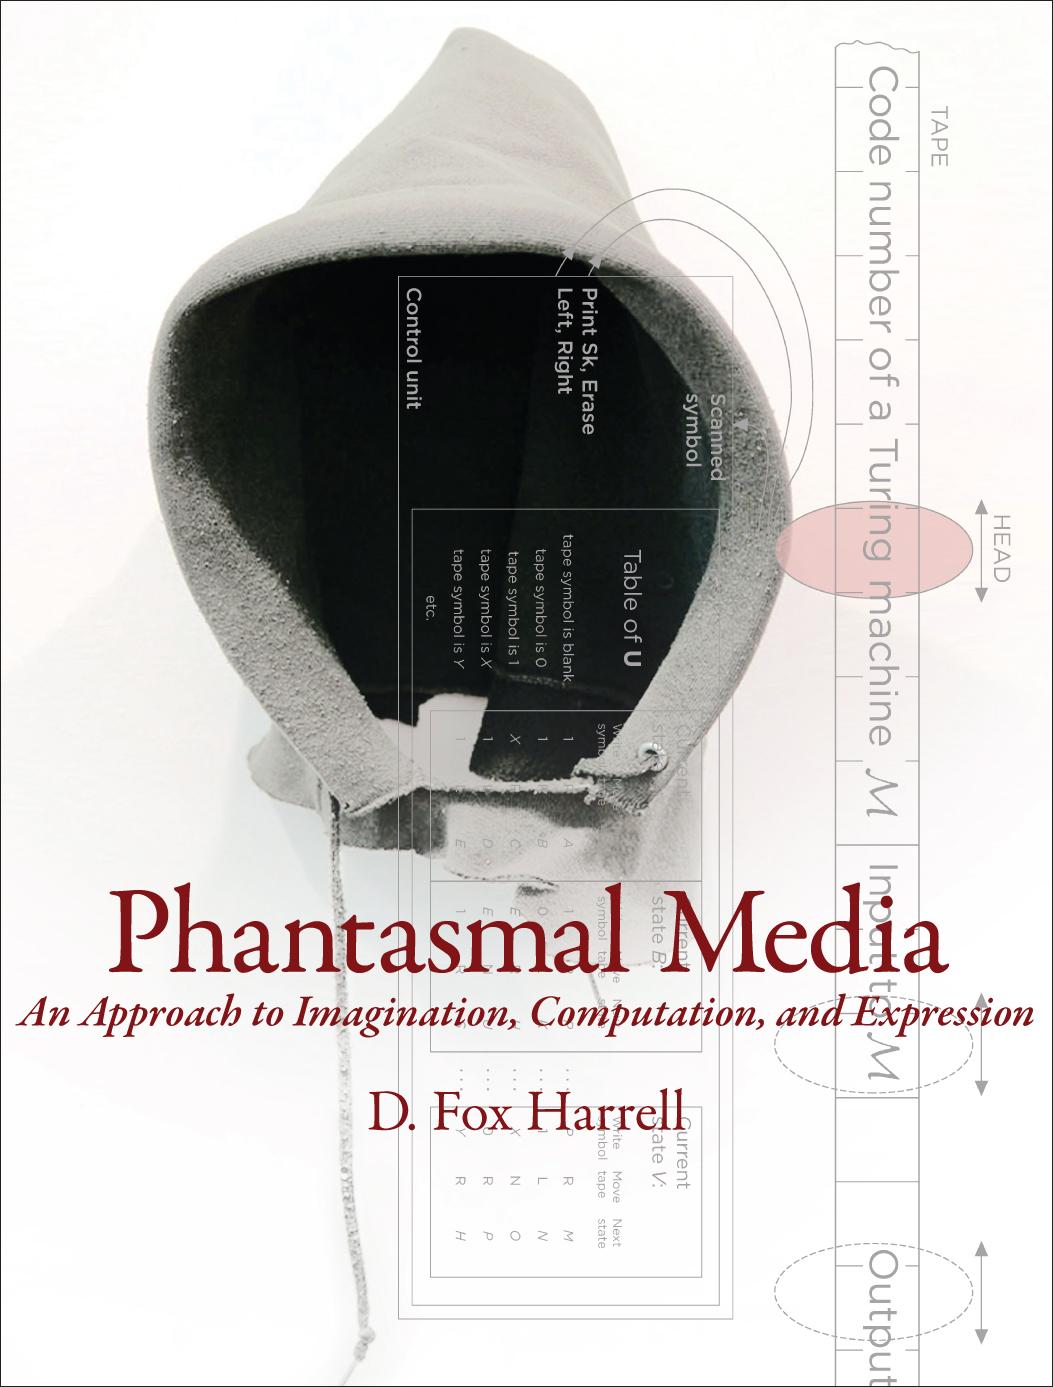 Phantasmal Media by D. Fox Harrell (MIT Press)